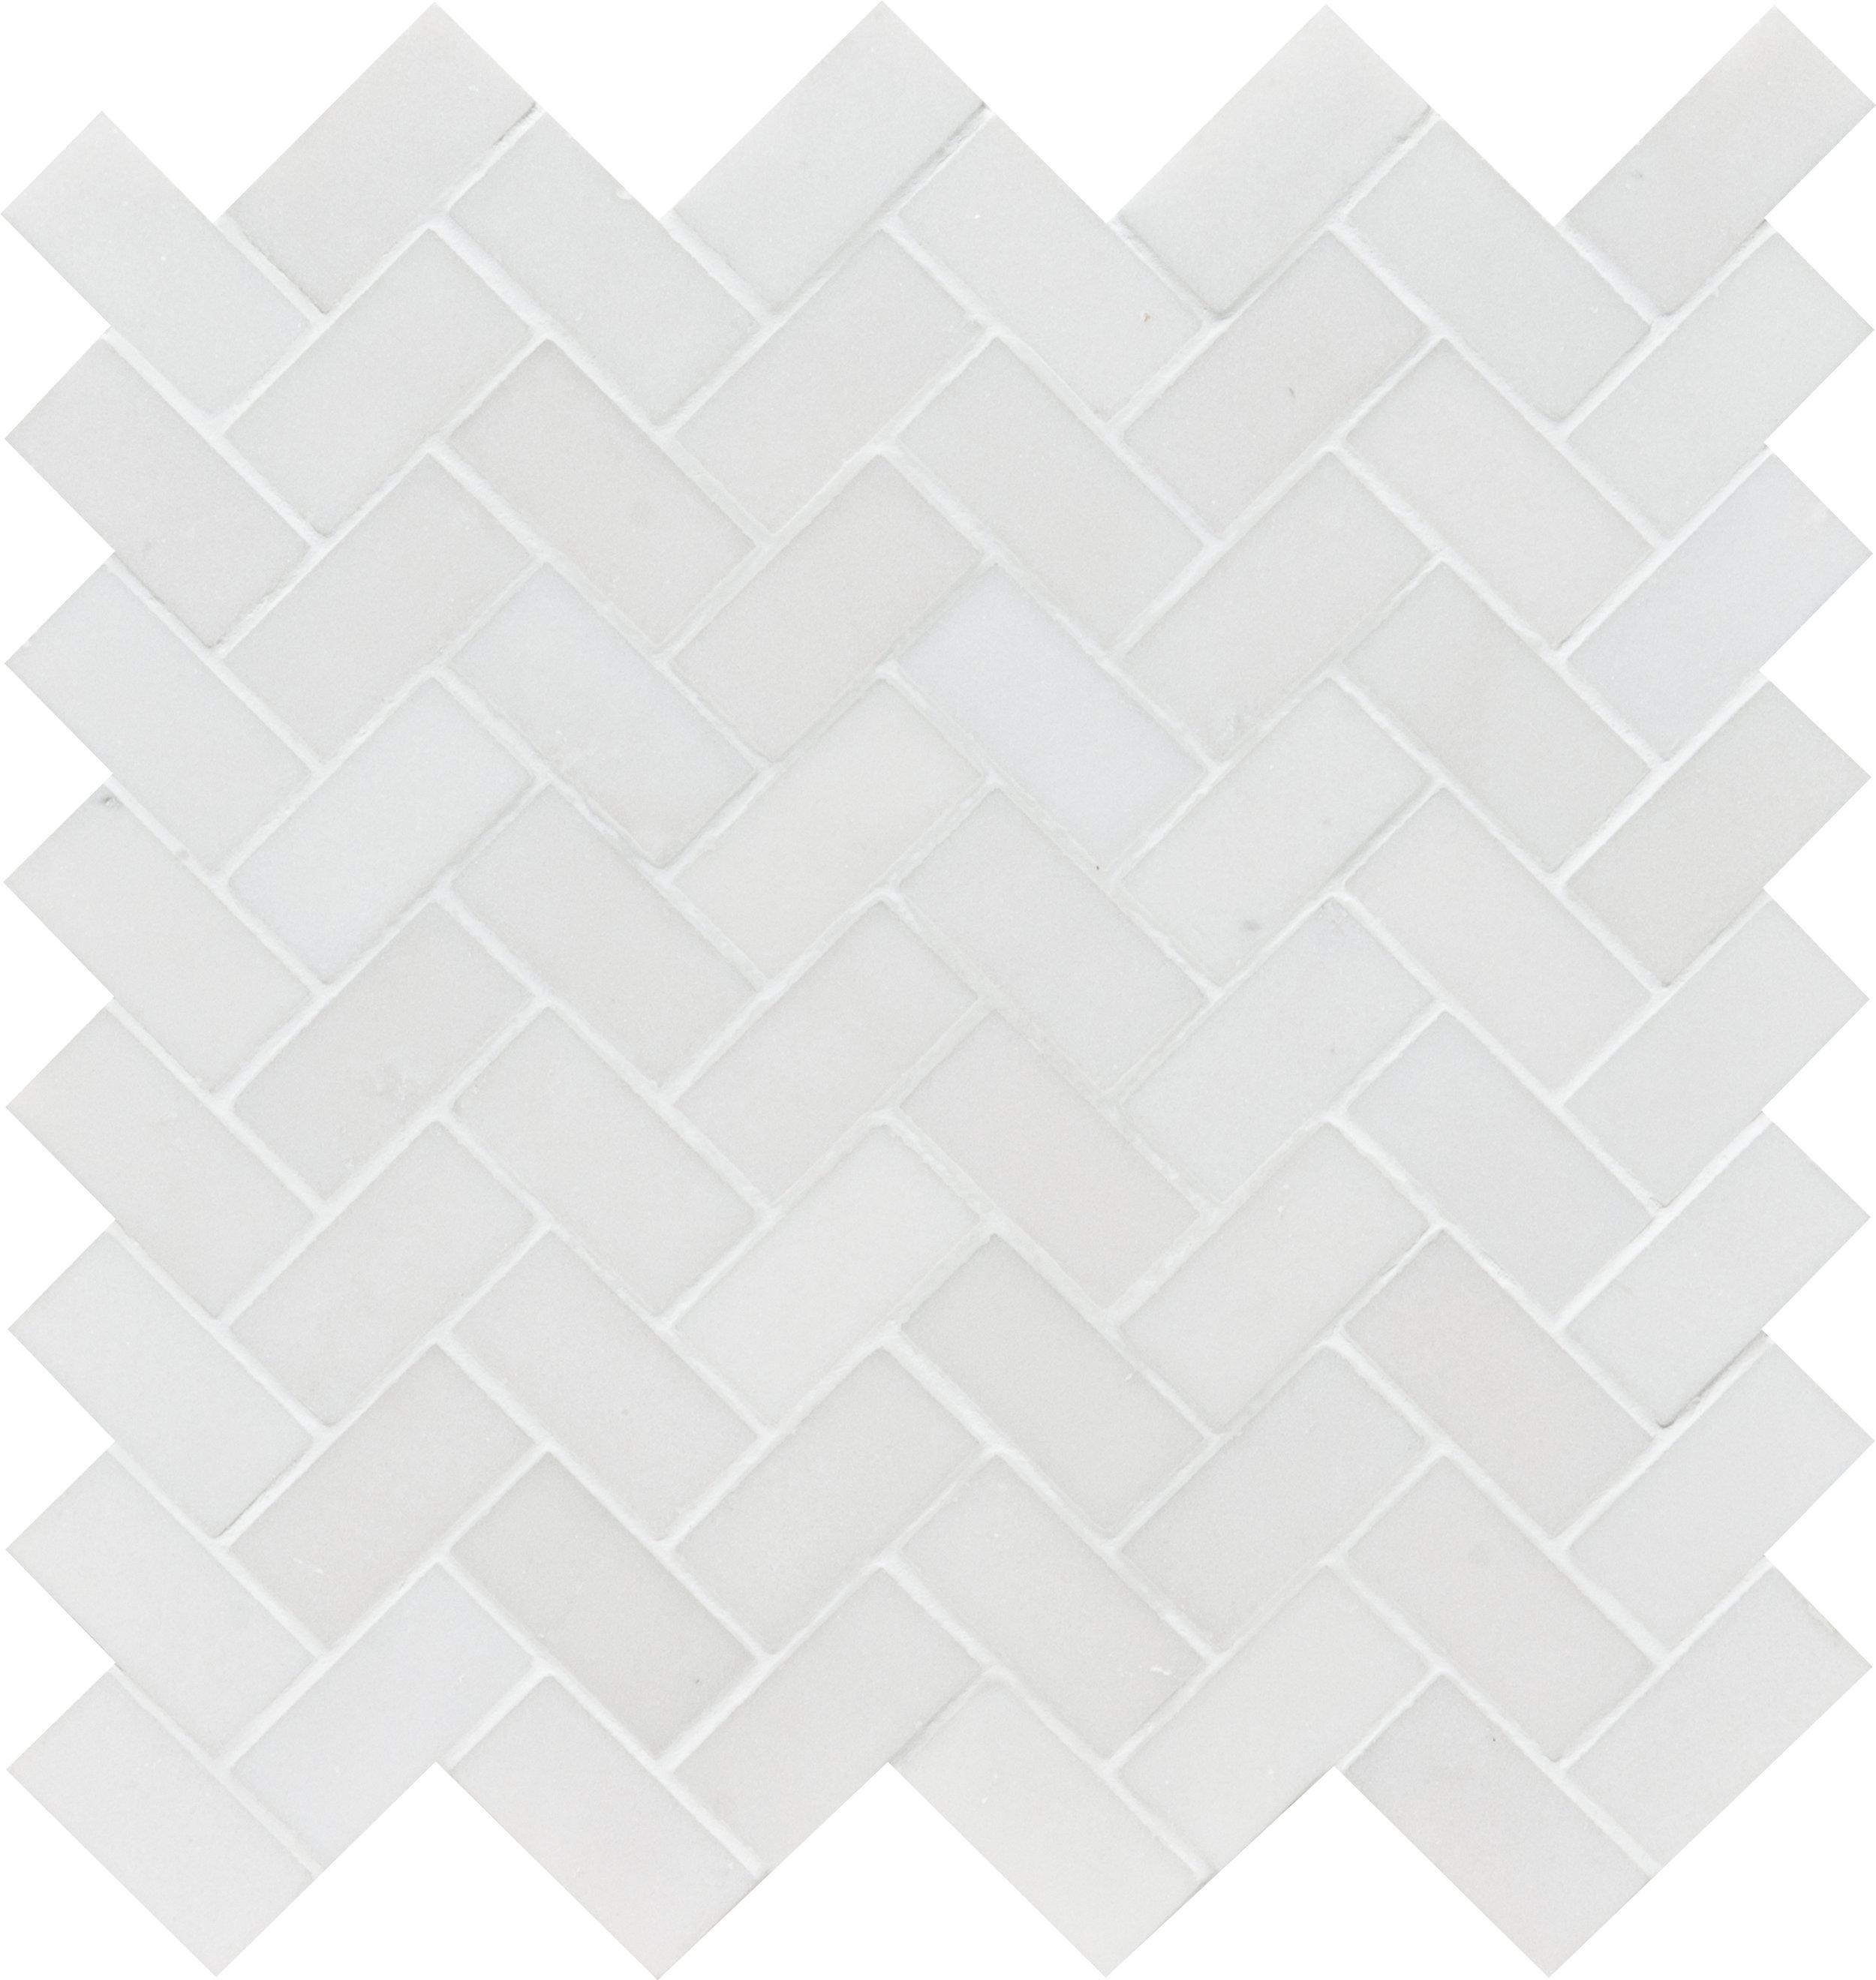 "MS01335 aspen white honed herringbone 1""x2"" - 12 1/8""x13 3/8""x3/8"" sheets"